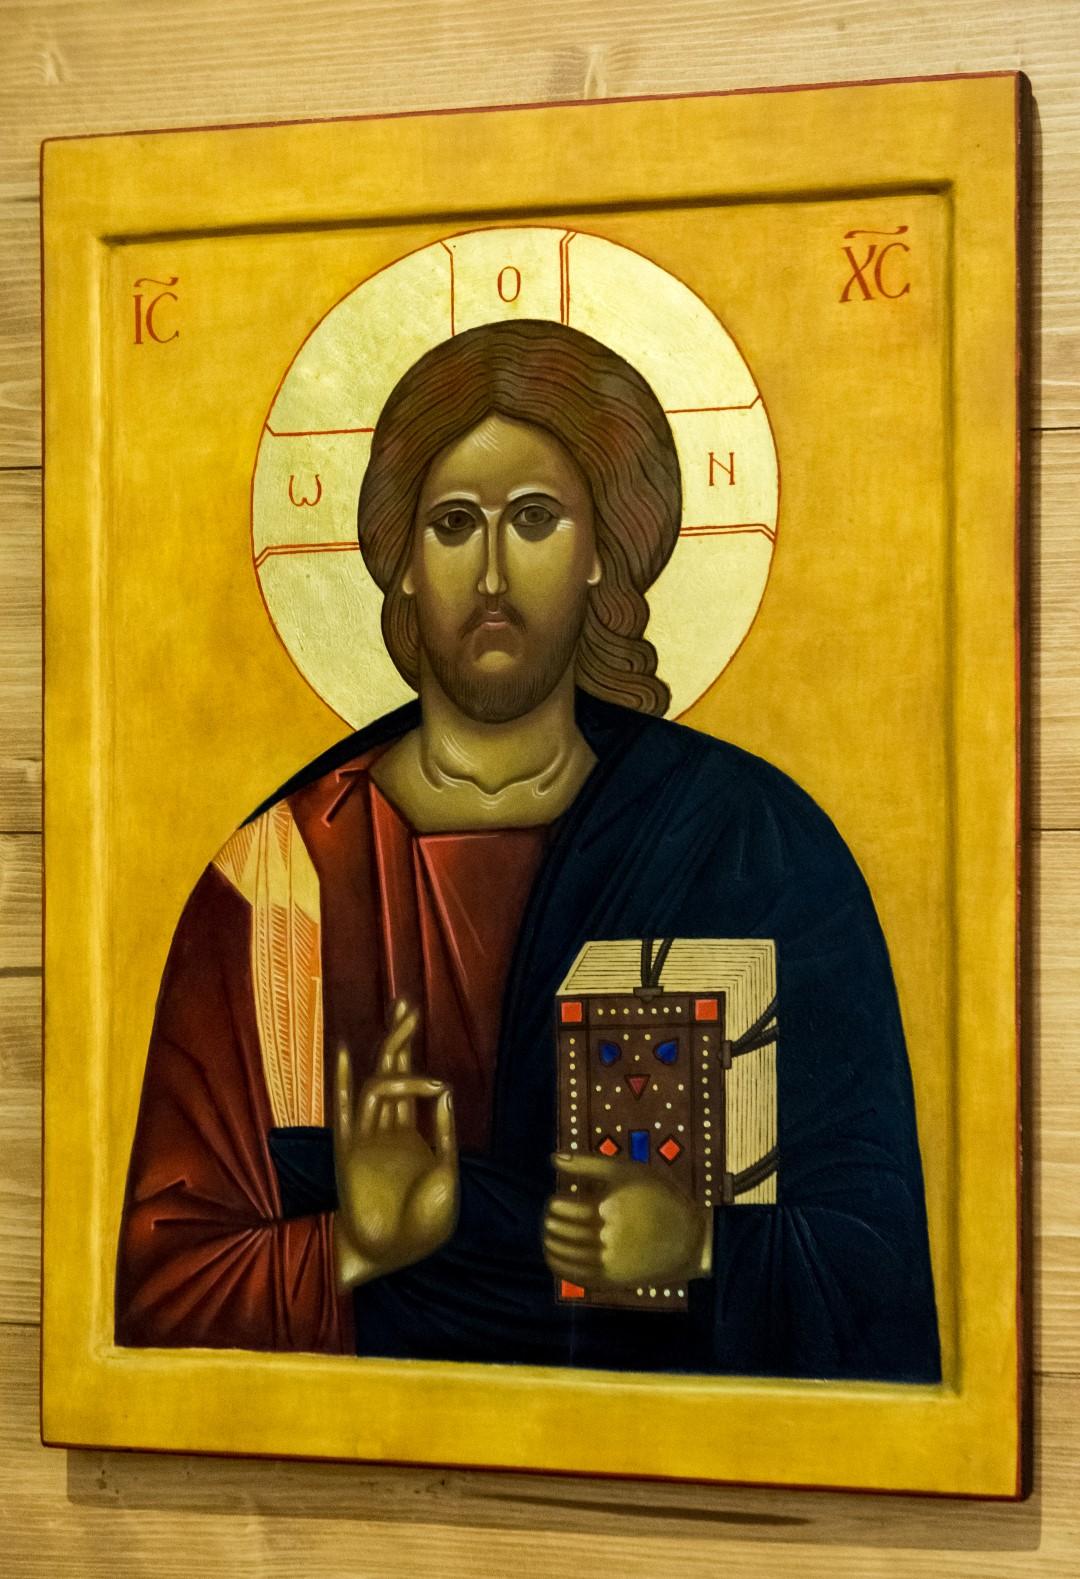 Christus-Ikone